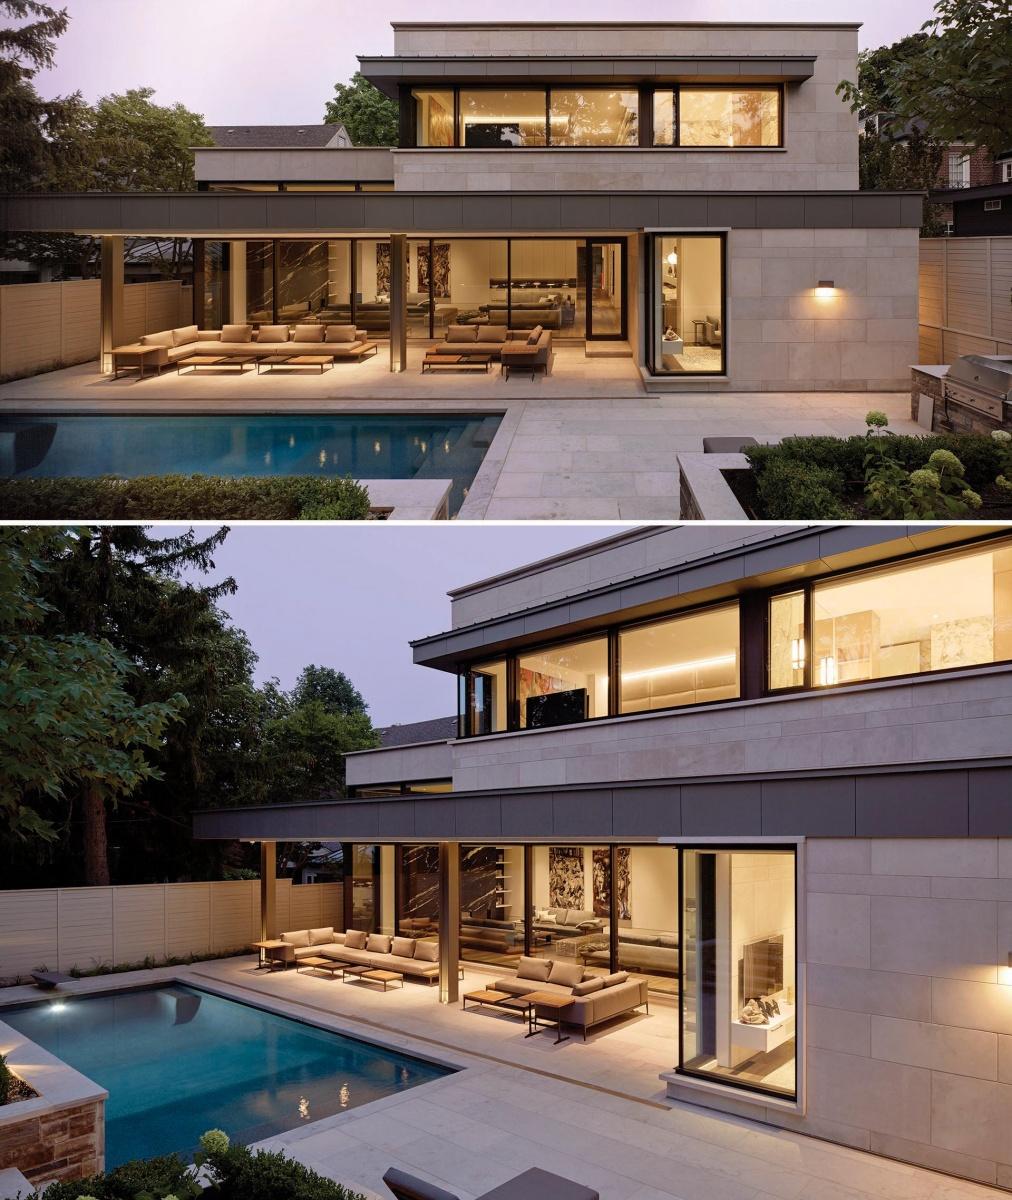 modern-house-architecture-limestone-280820-1043-04.jpg